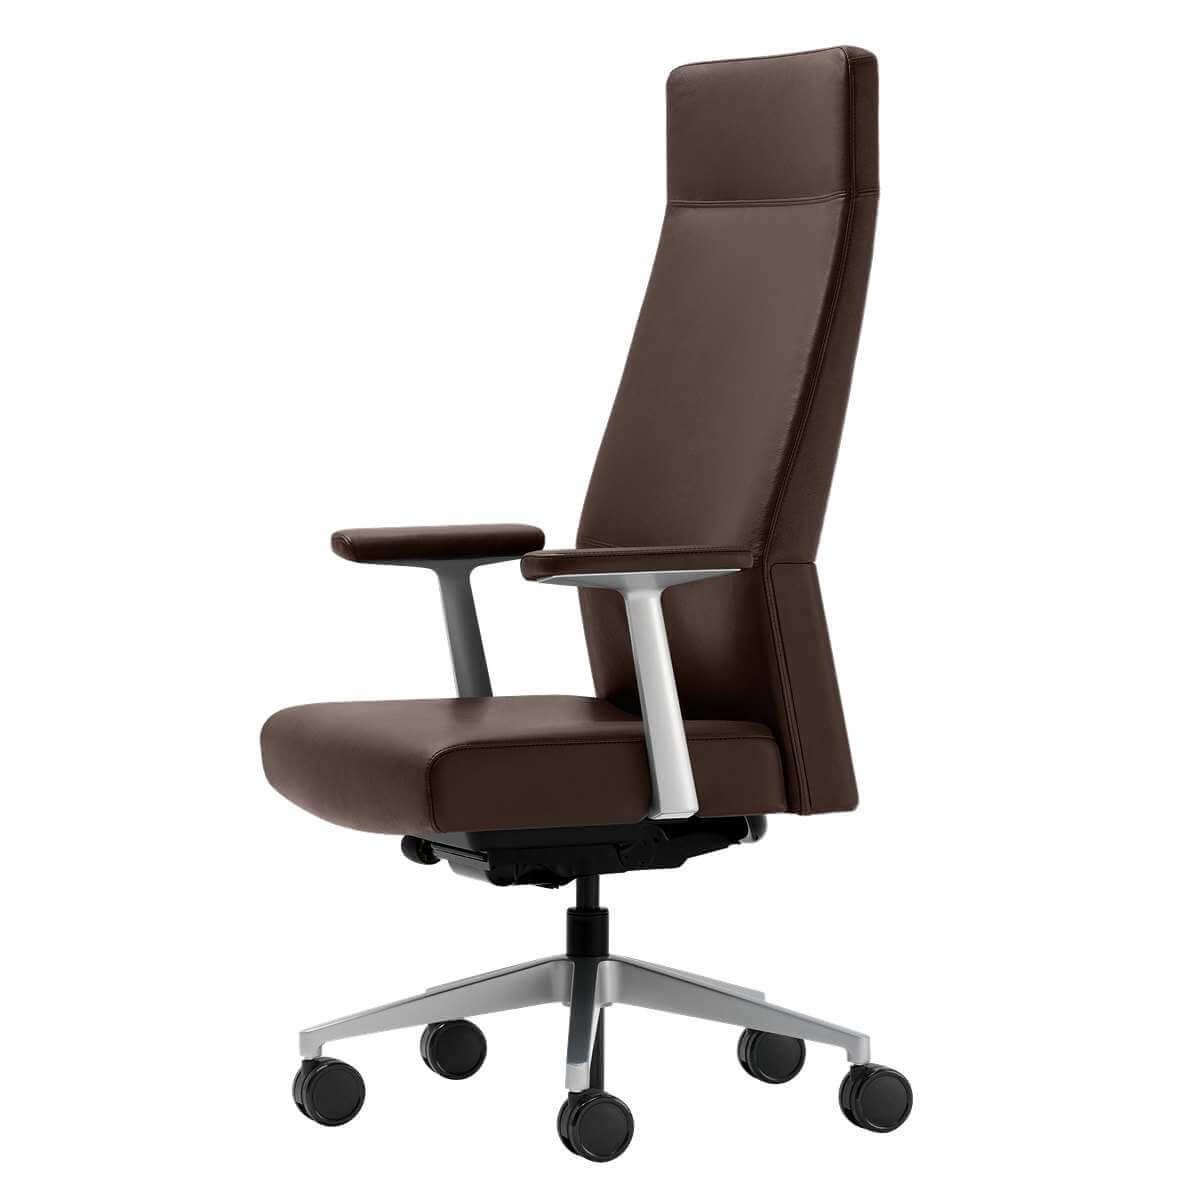 Ergonomic Office Chair - Siento 5